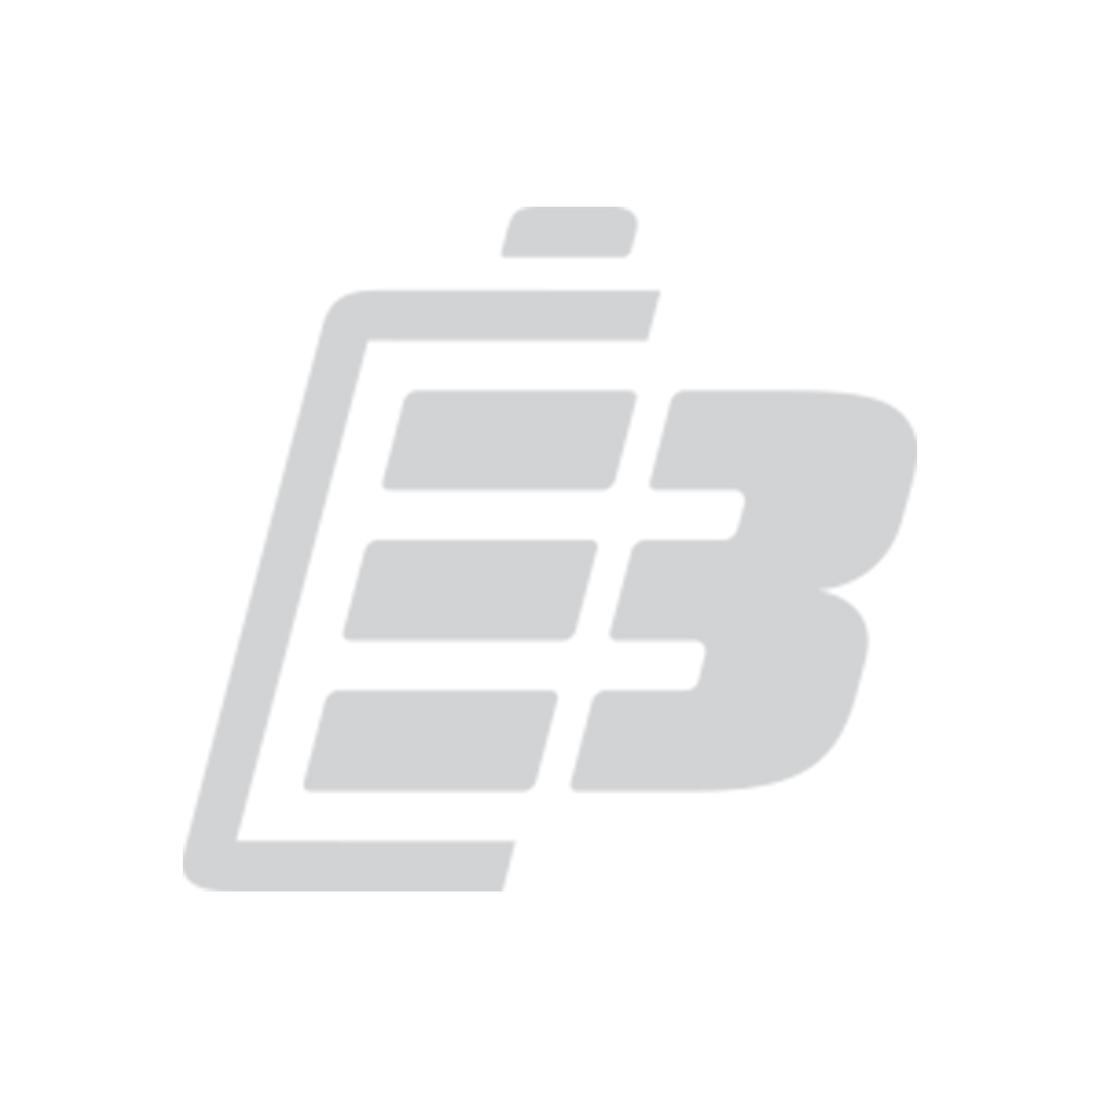 Wireless headset battery Plantronics Explorer 350_1